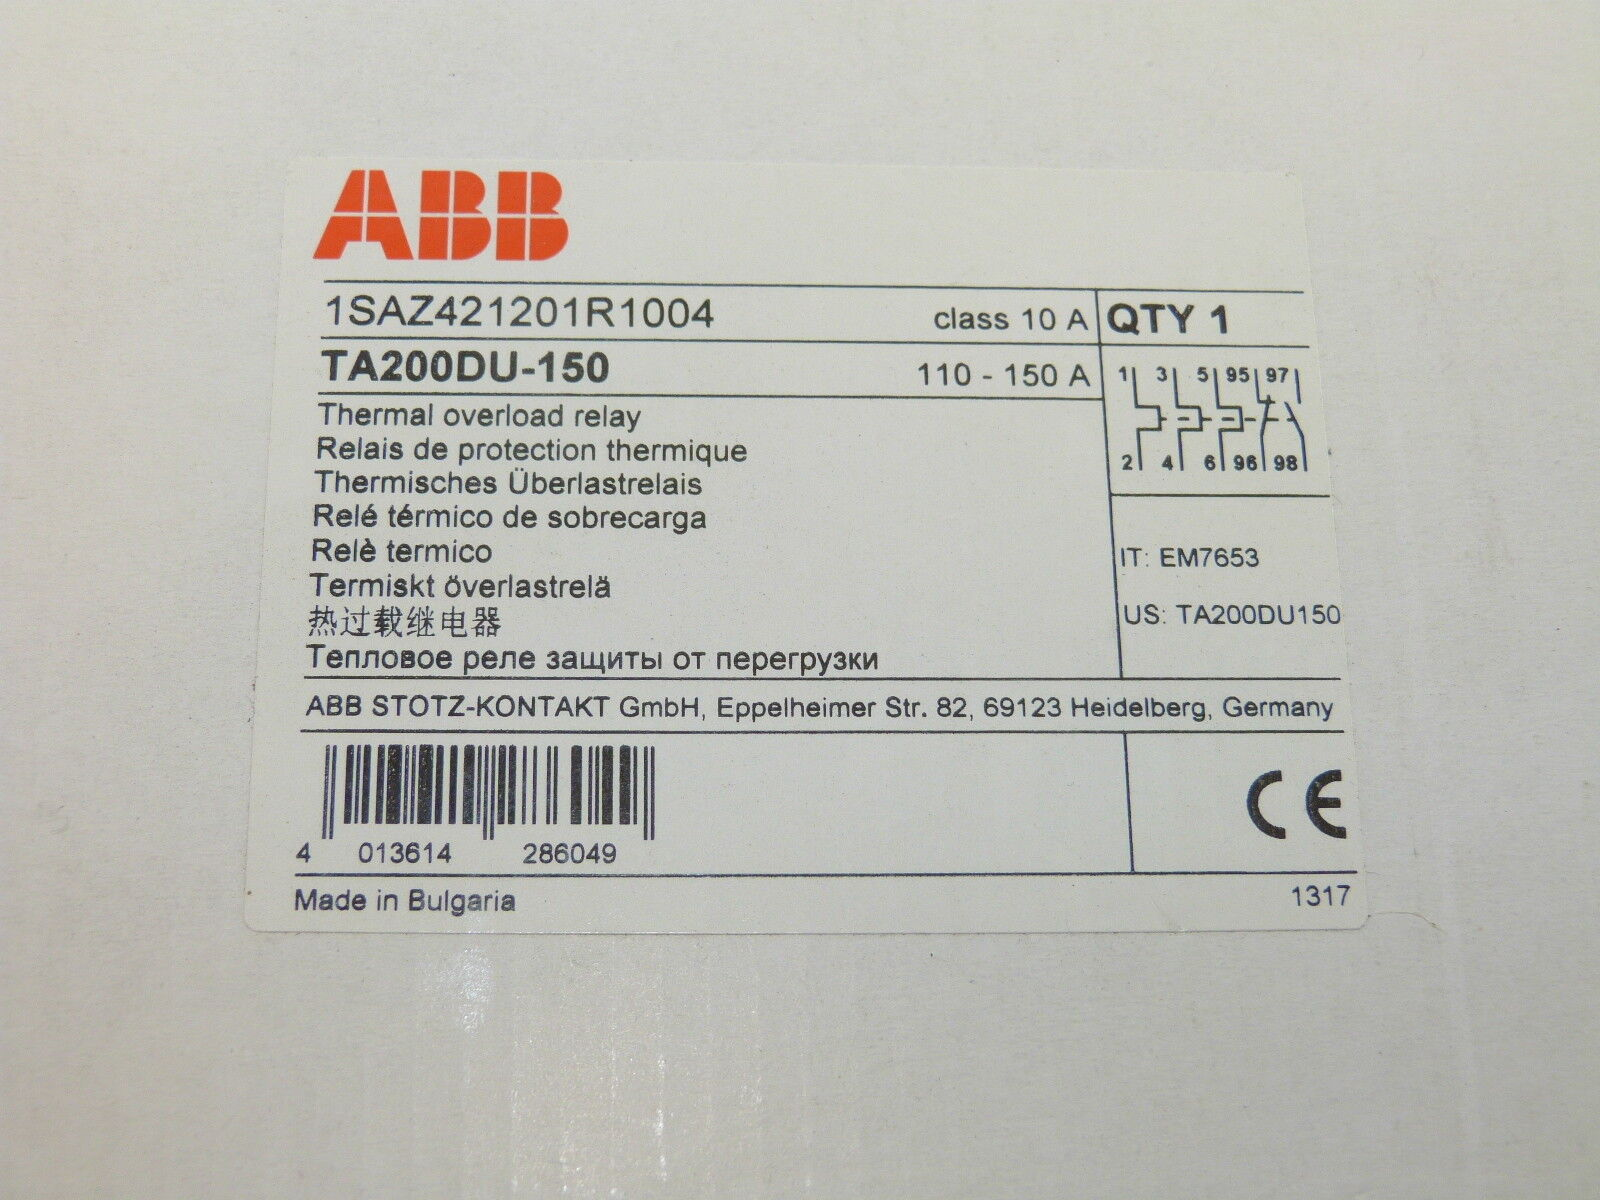 ABB TA200DU-150 Thermal Overload Relay 110-150a NEW 1yr Warranty